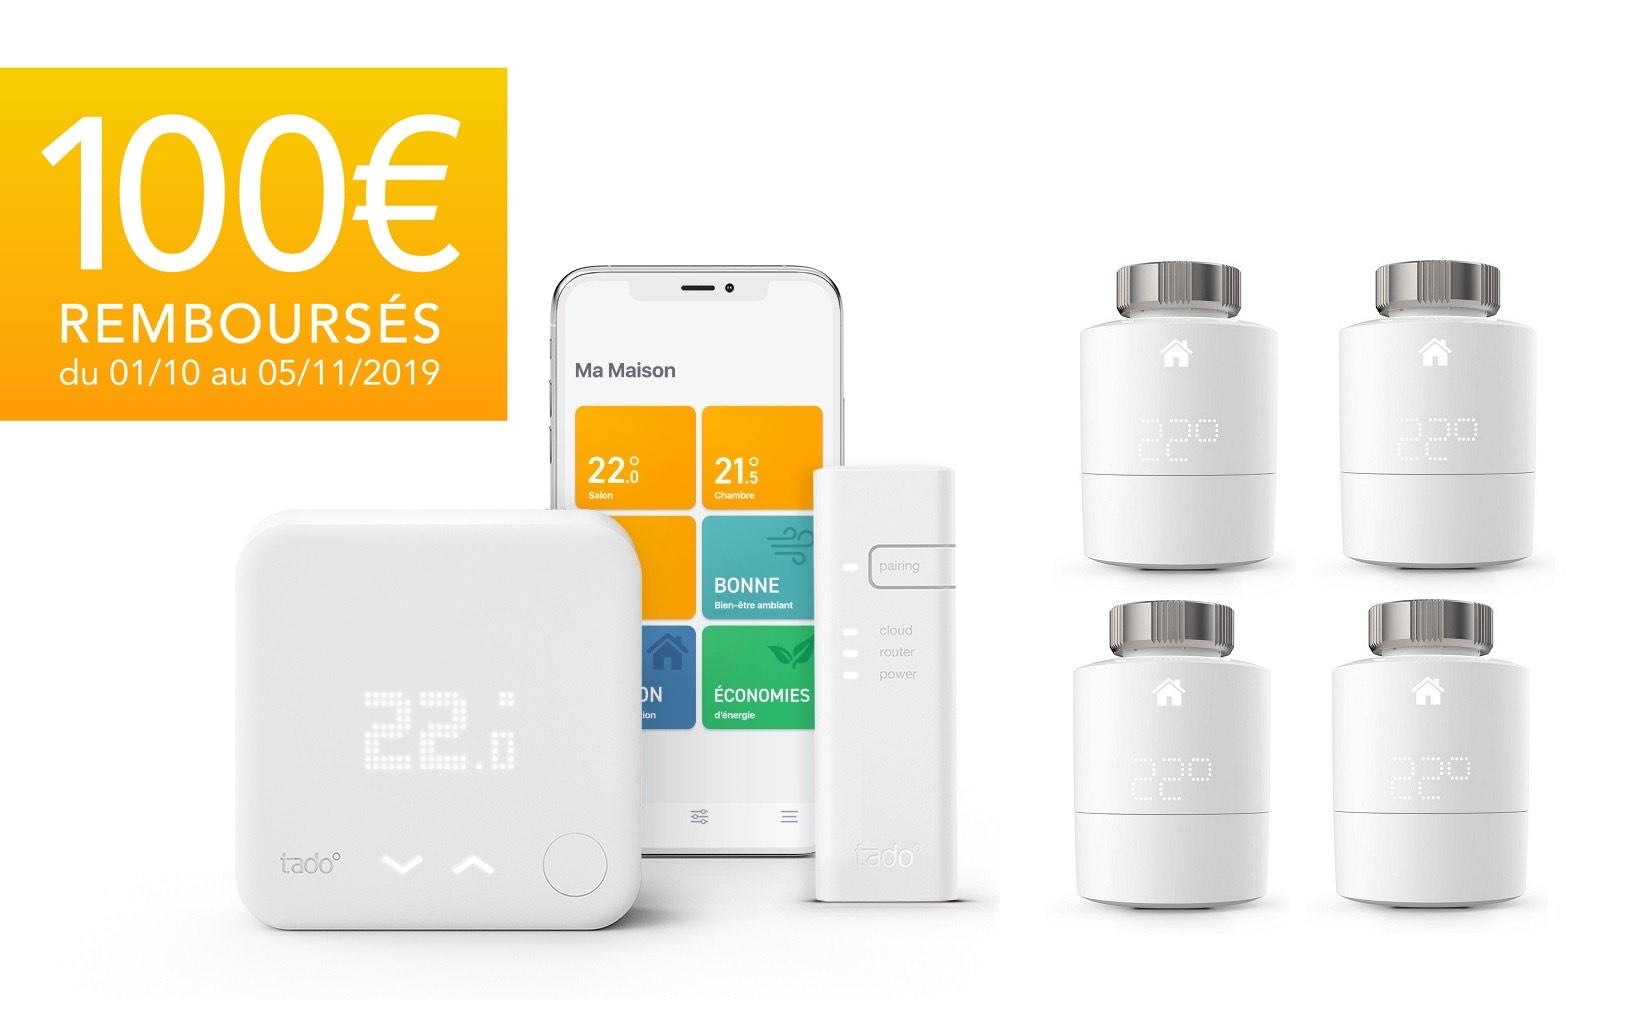 Thermostat intelligent Tado V3 + Kit de démarrage + 4 Têtes (Via ODR de 100€)